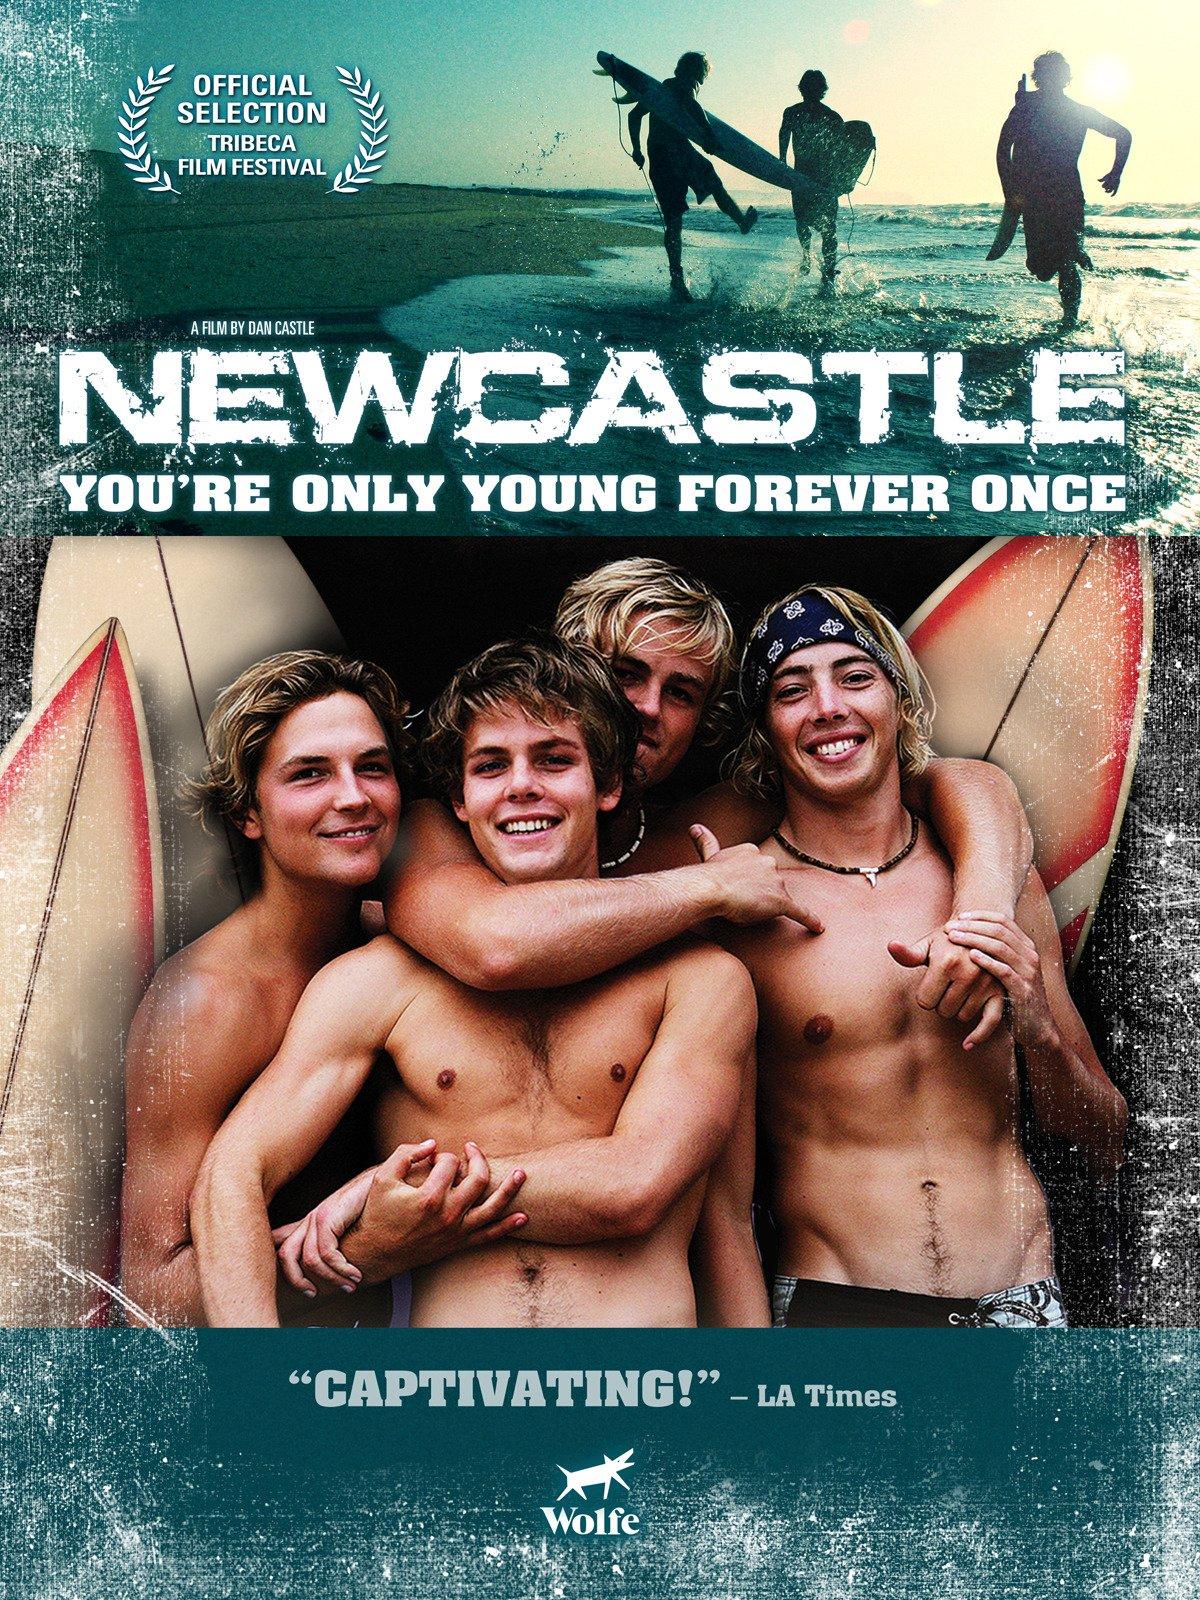 38 Gay Newcastle Cruising Areas, Gay guide 2020